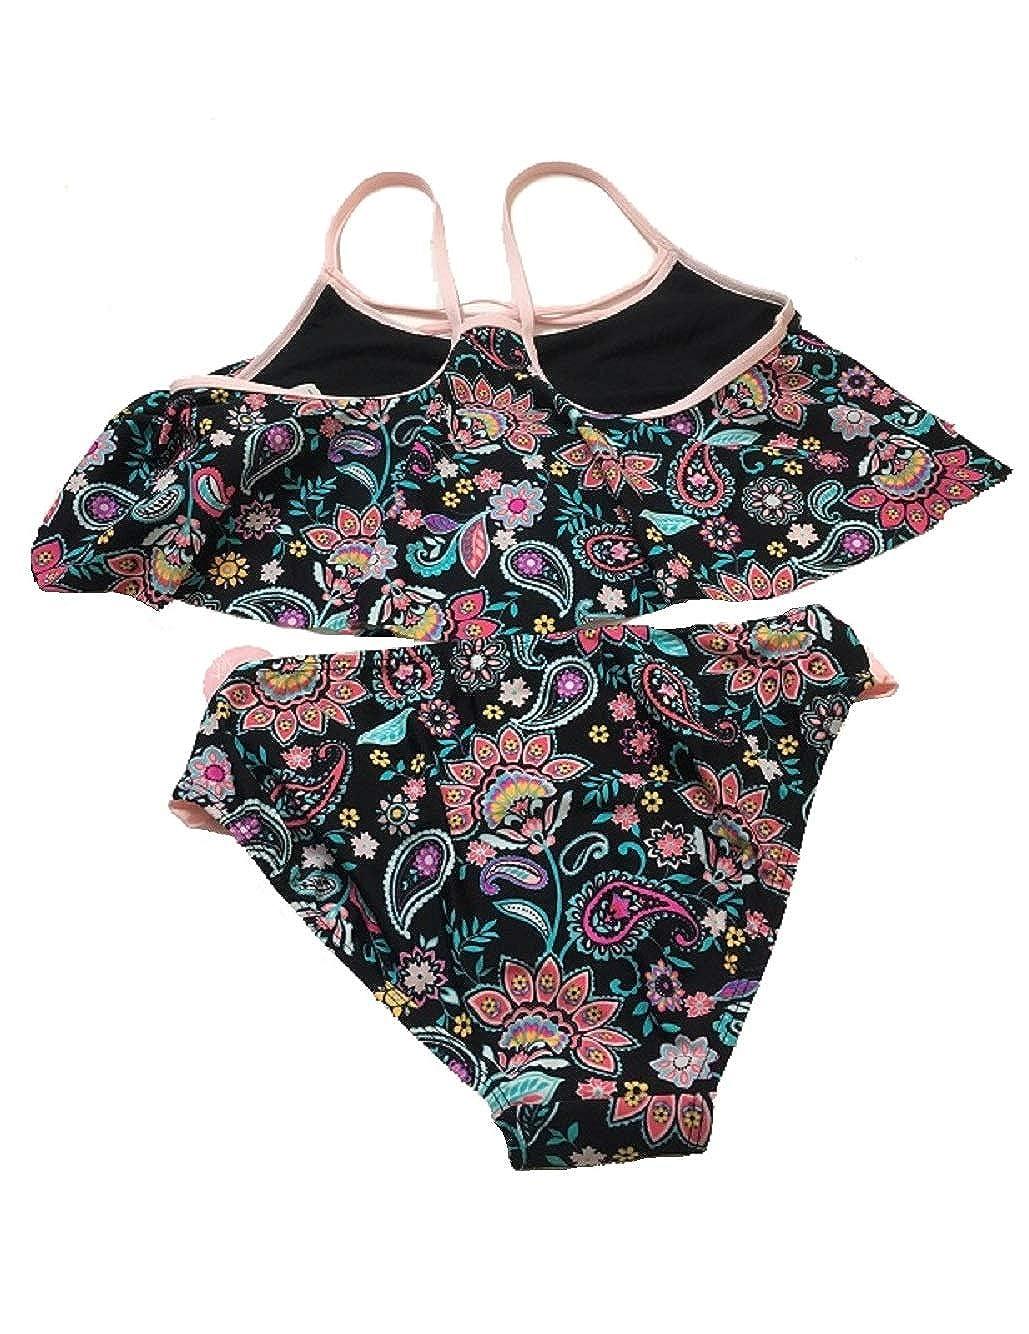 Summer Crush Big Girls 2-Pc.Black Multi Bikini Swimsuit 16